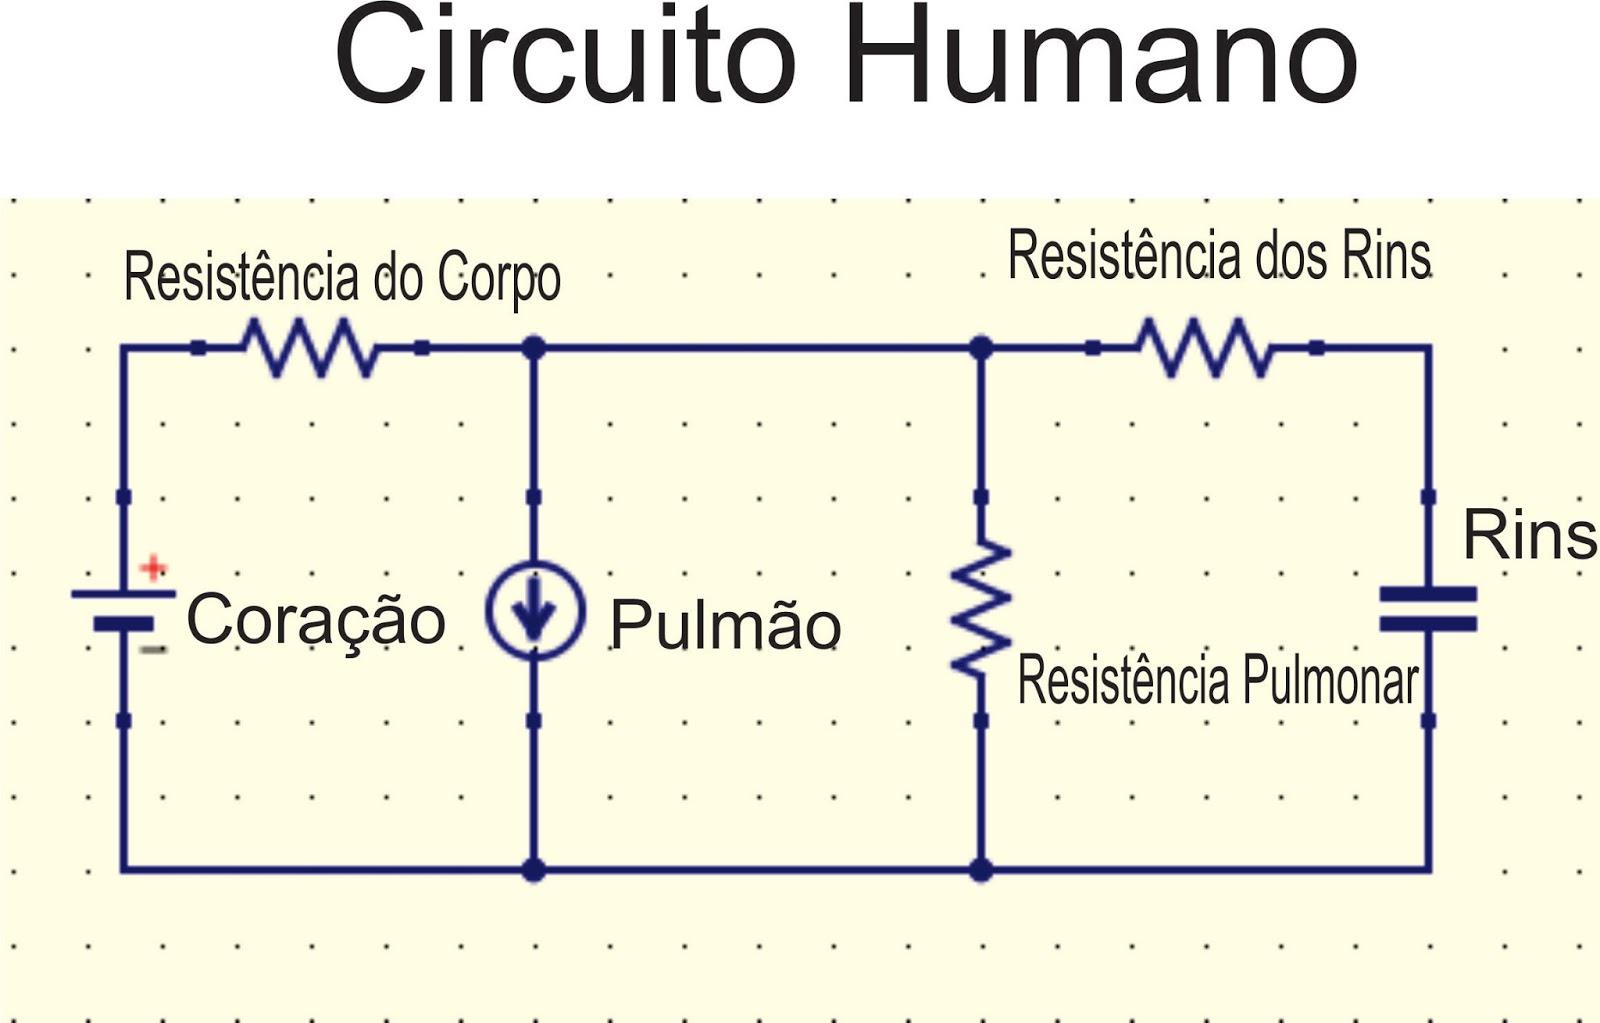 Circuito Eletricos : Biofísica aplicada circuito humano circuito elétrico que dá a vida